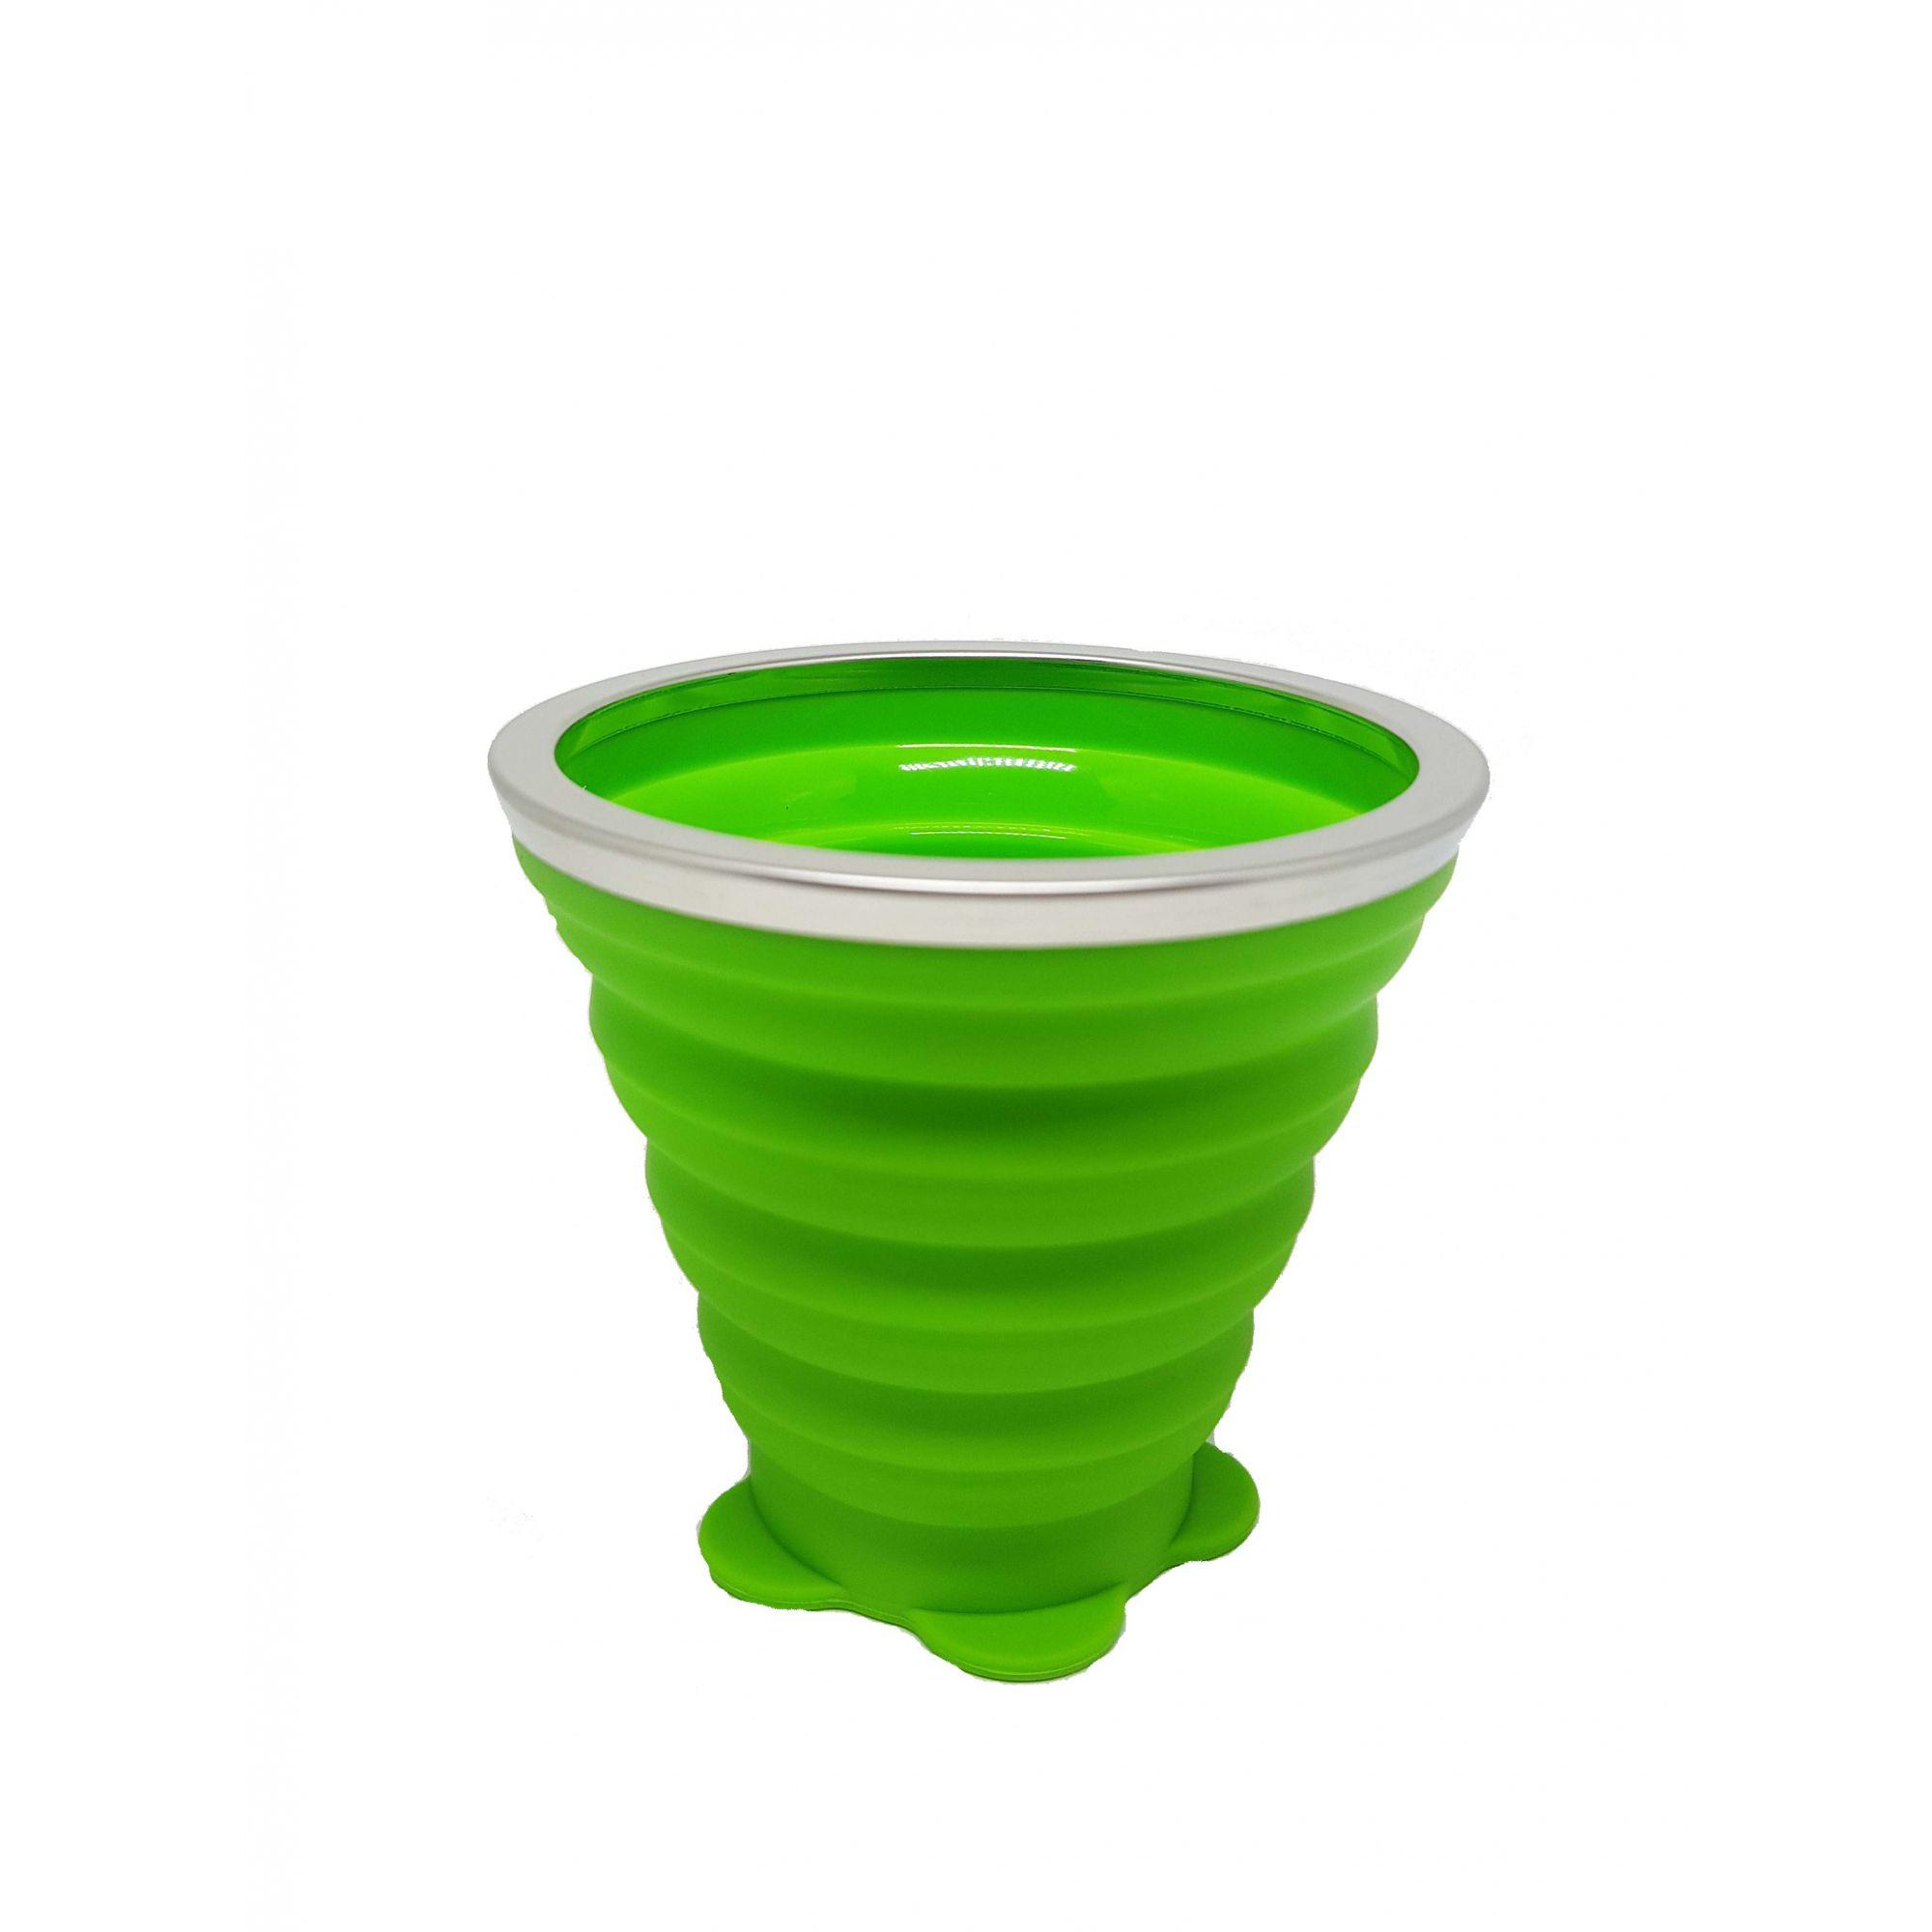 Copo de Silicone Retrátil - 260ml Verde